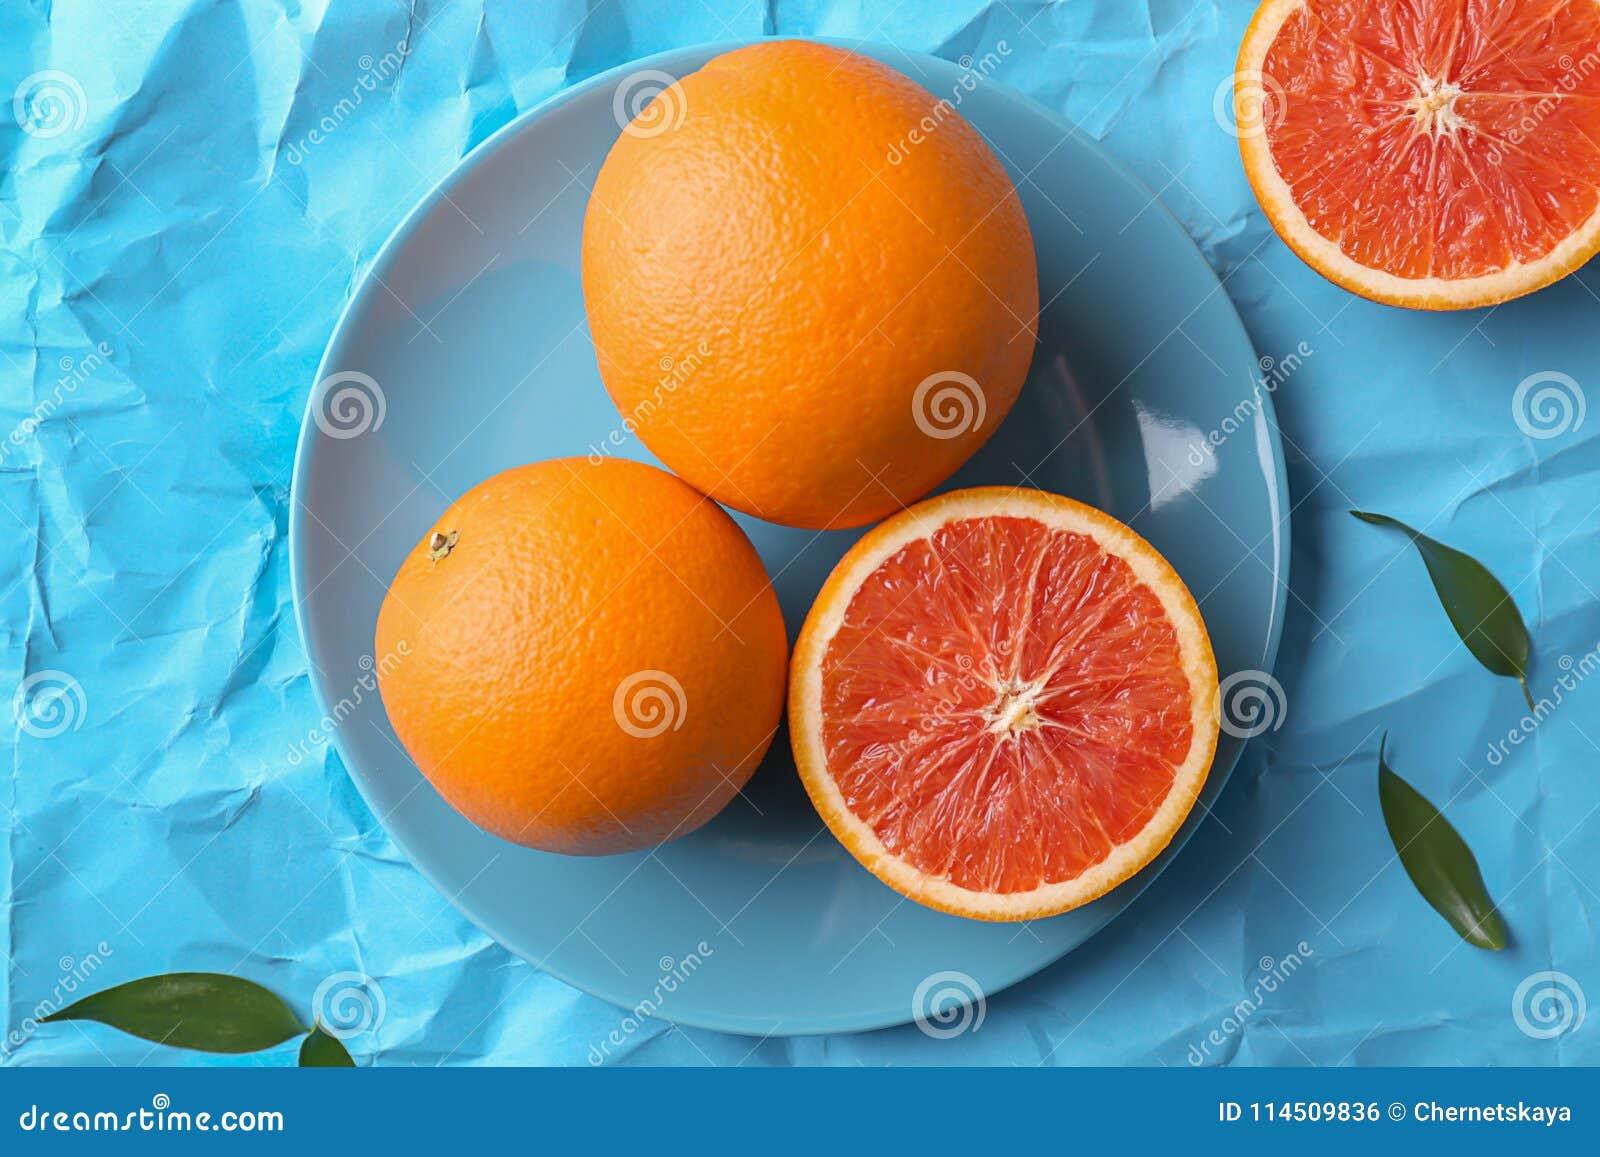 Plaat met verse yummy sinaasappelen